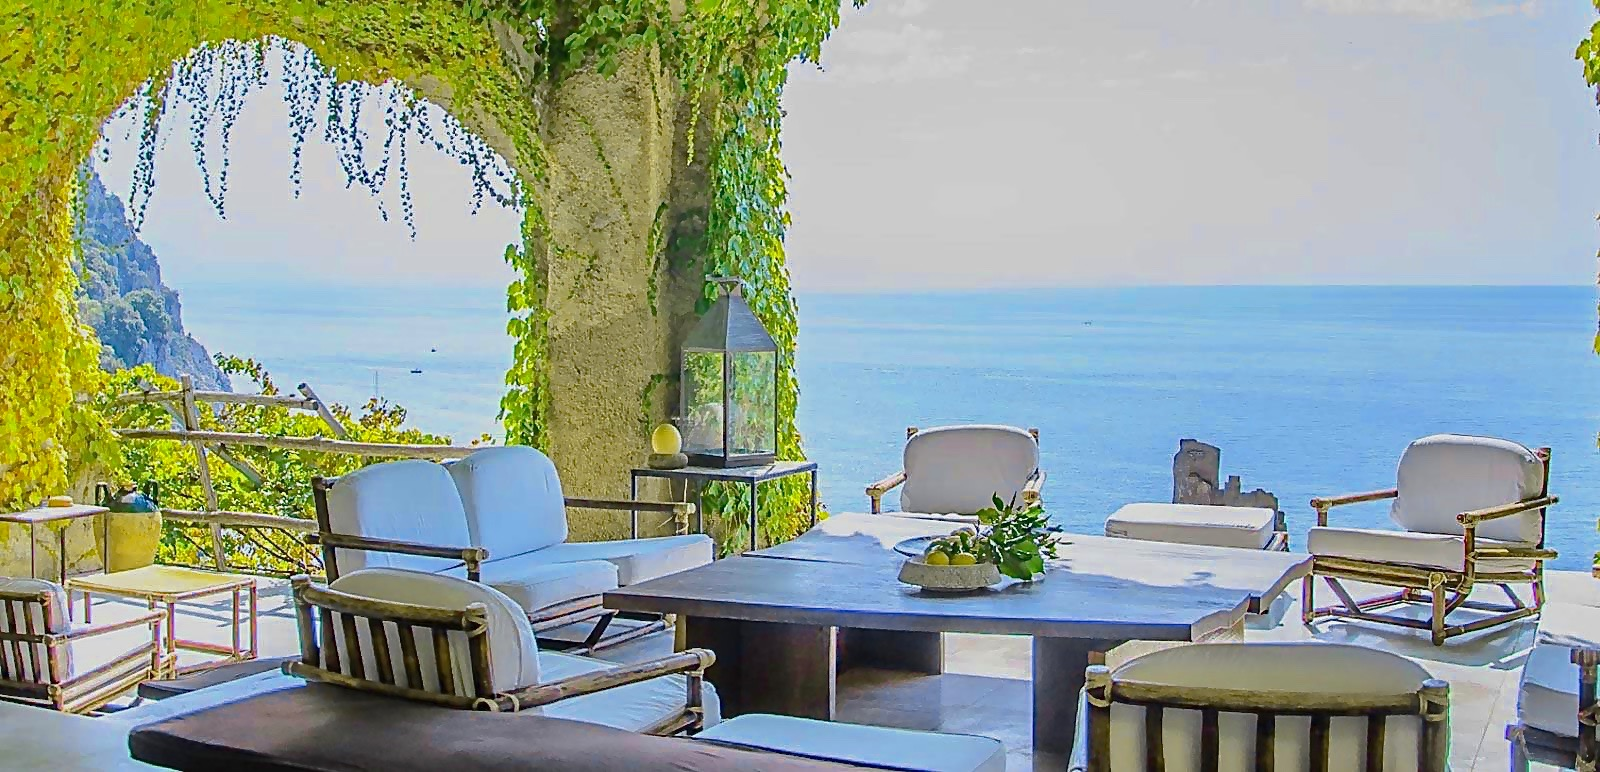 Luxury Villa Amalfi Coast 1 2